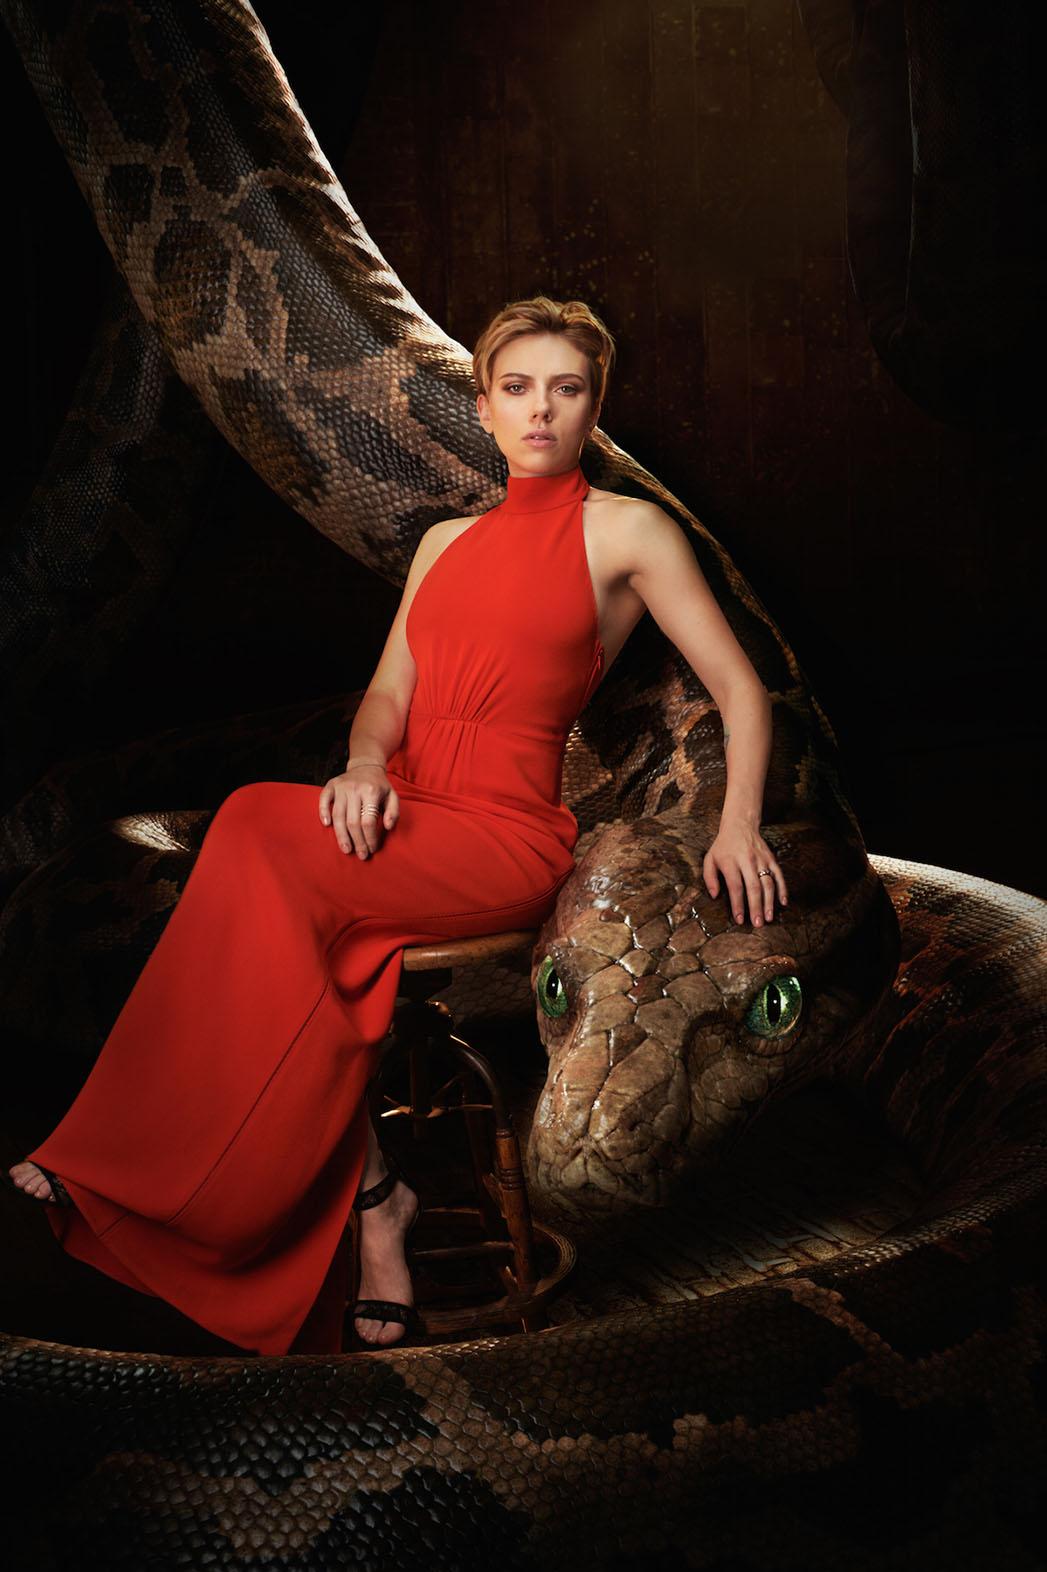 The Jungle Book Scarlett Johansson Art - Publicity - P 2016